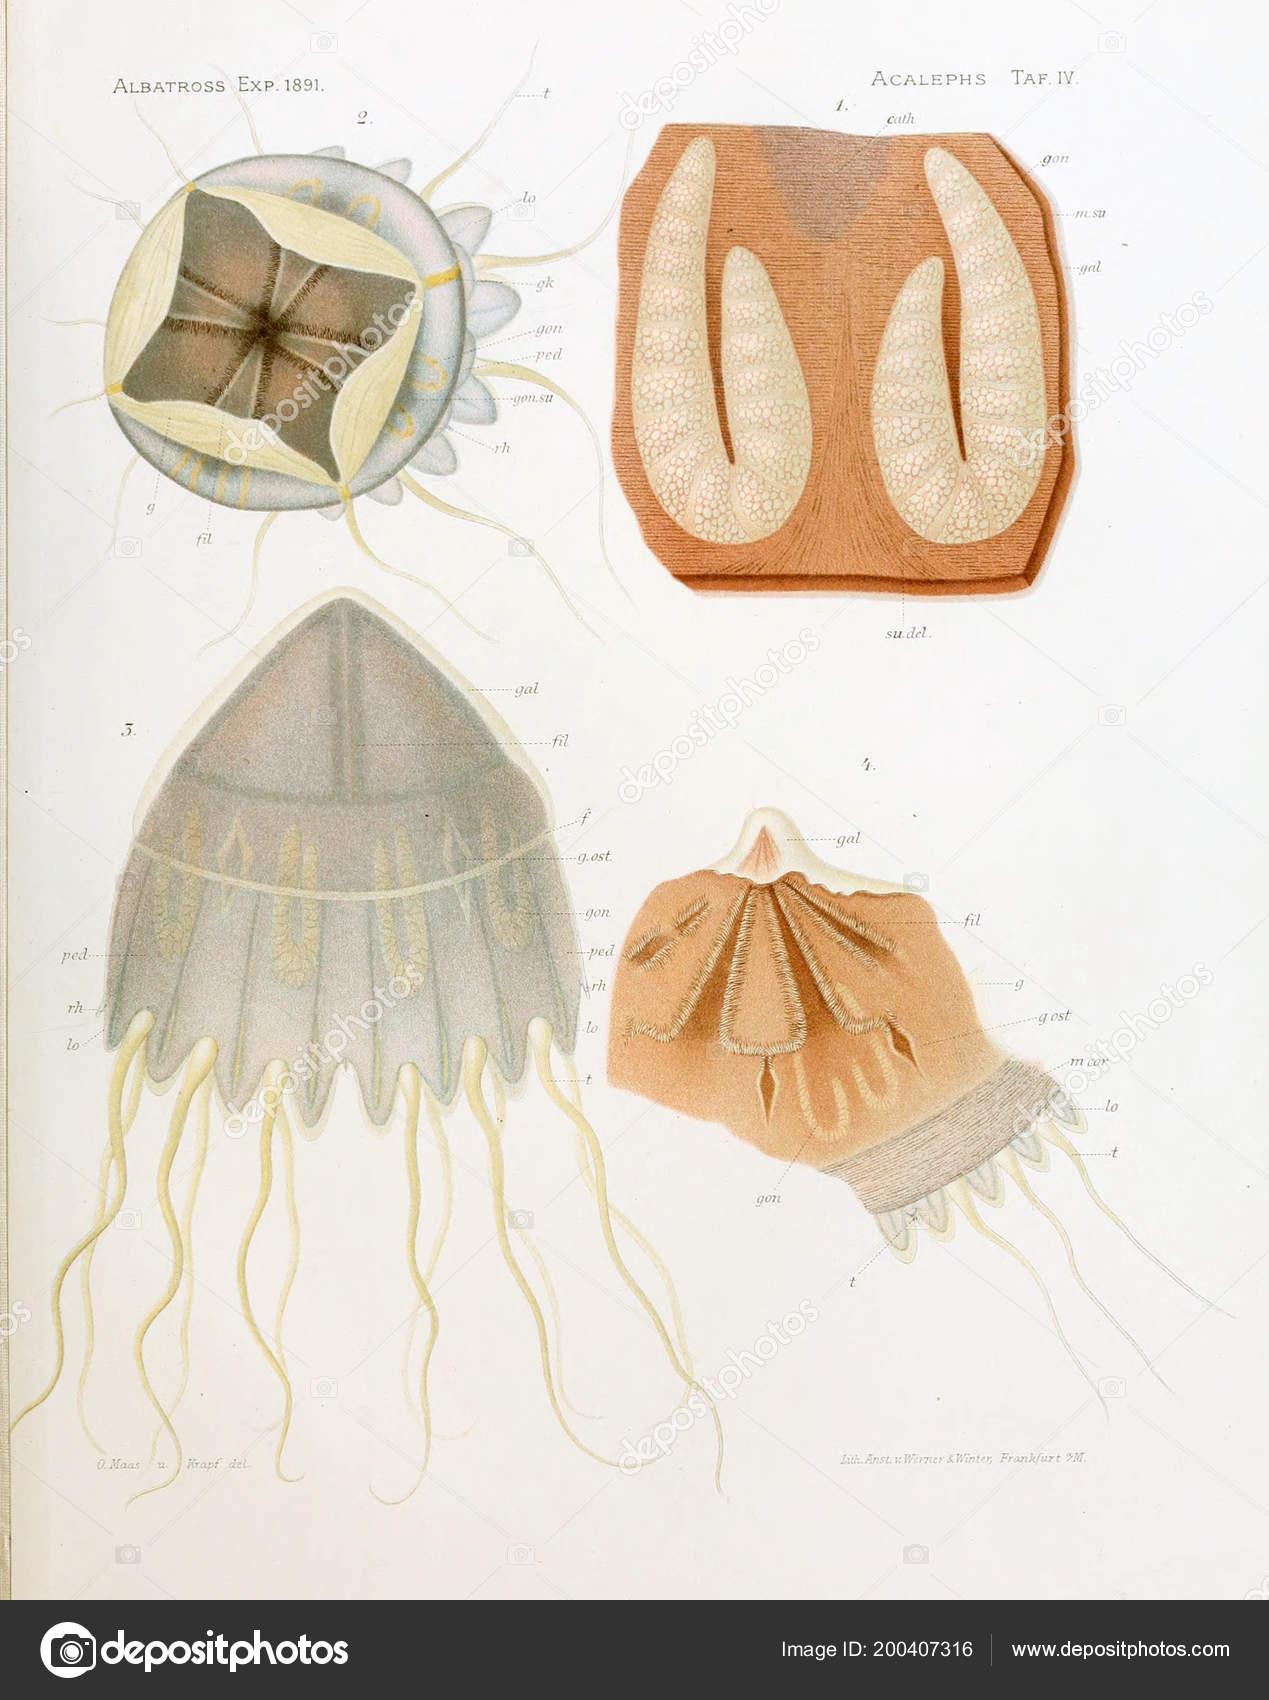 Illustration Anatomy Jellyfish — Stock Photo © ruskpp #200407316